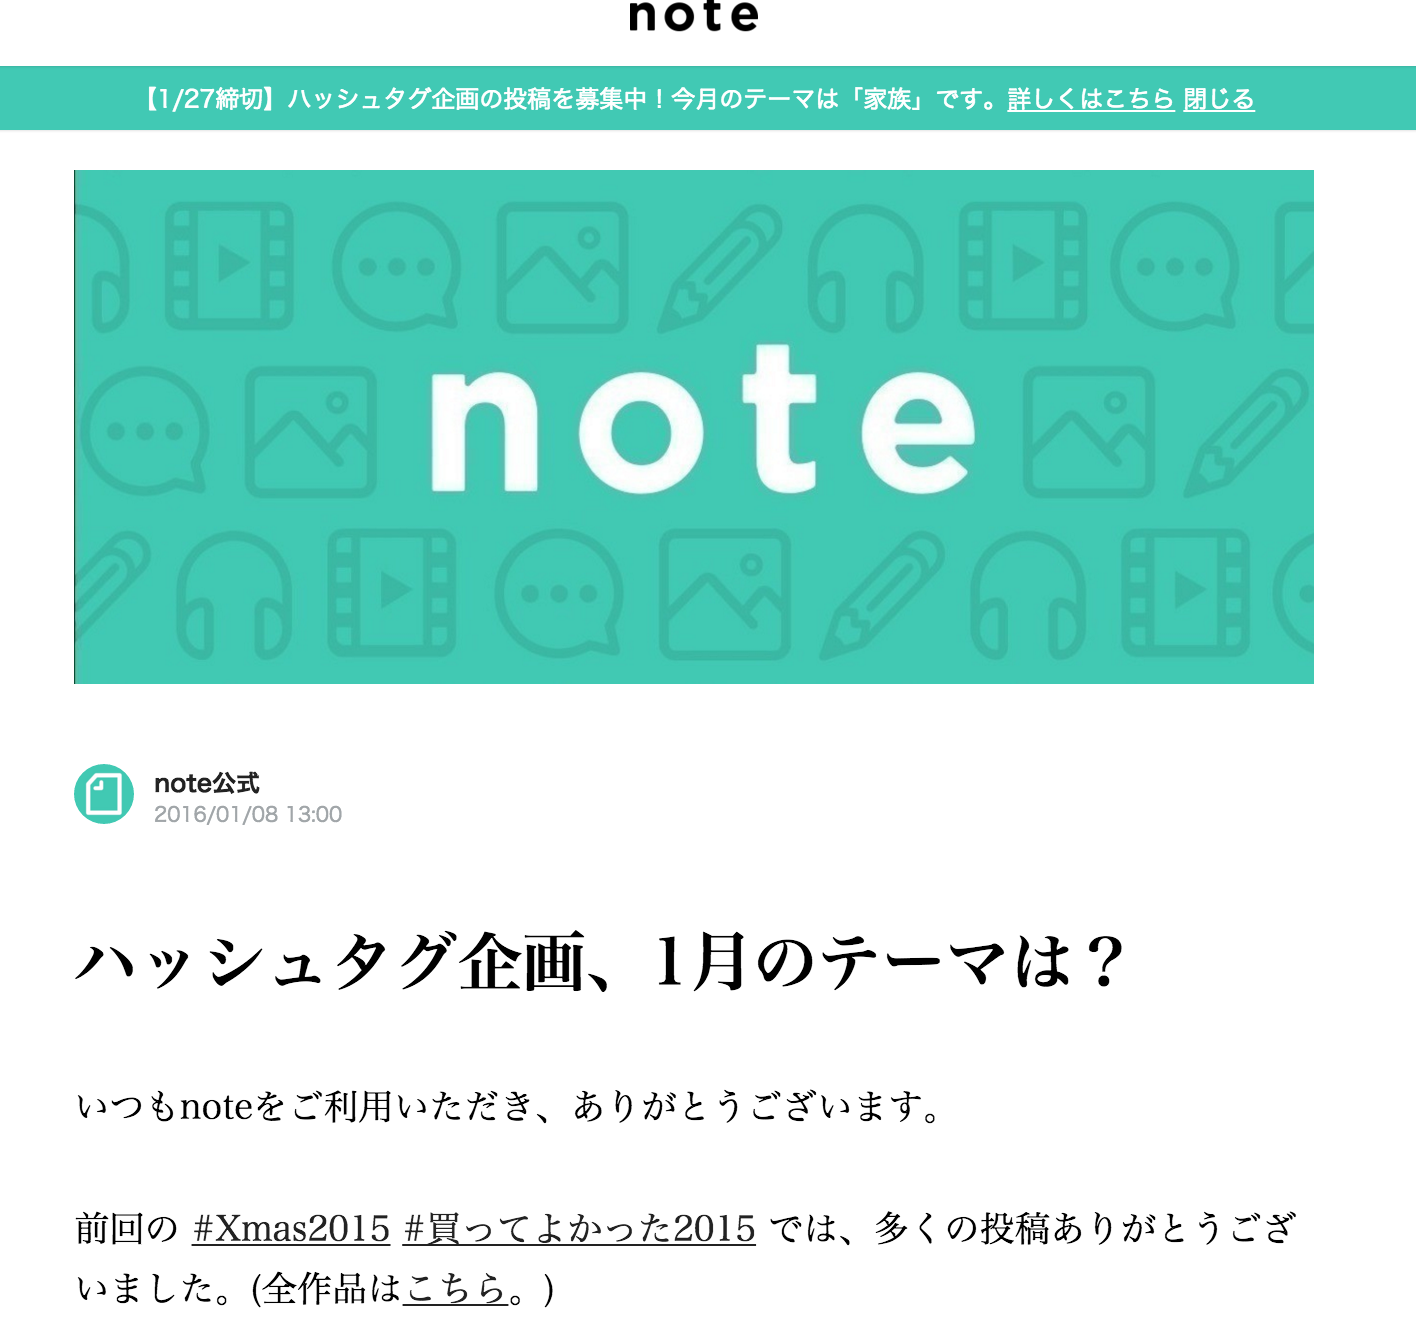 noteの企画